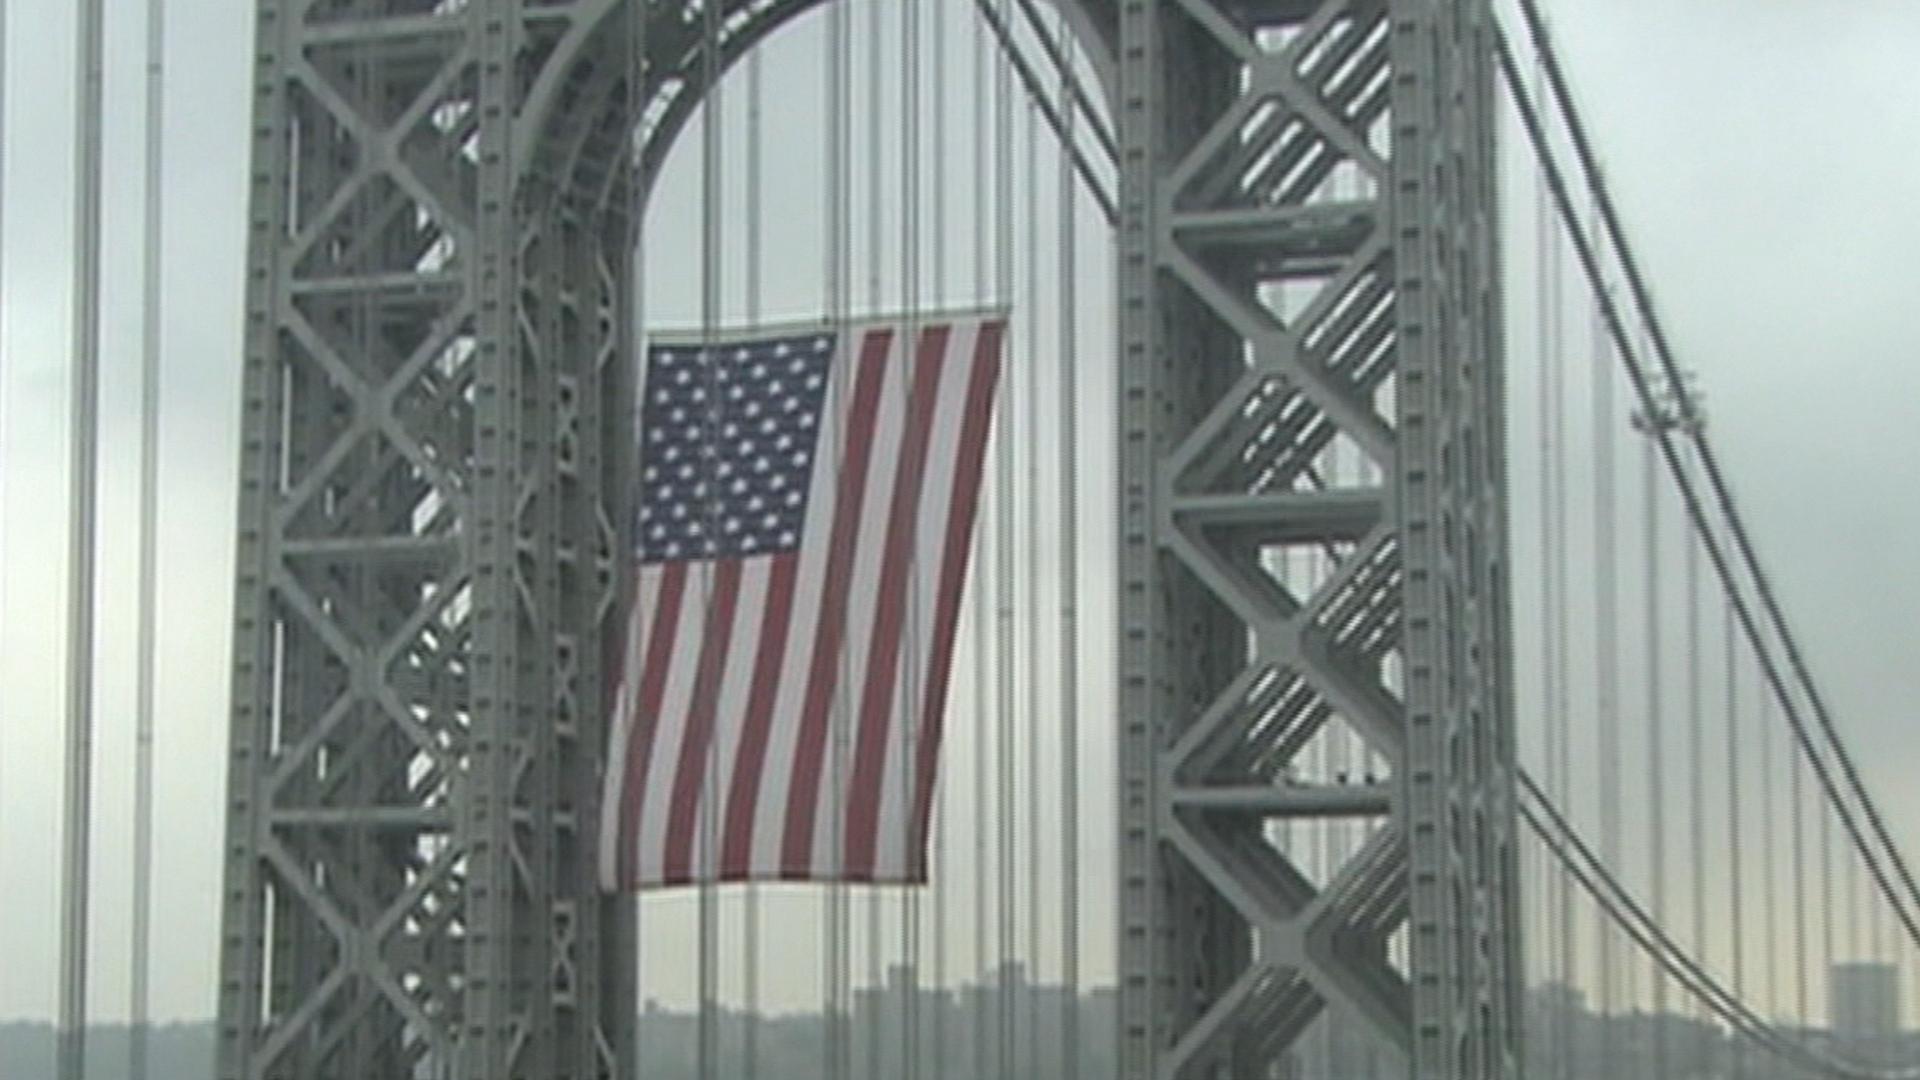 NJ bridge story extending into scandal